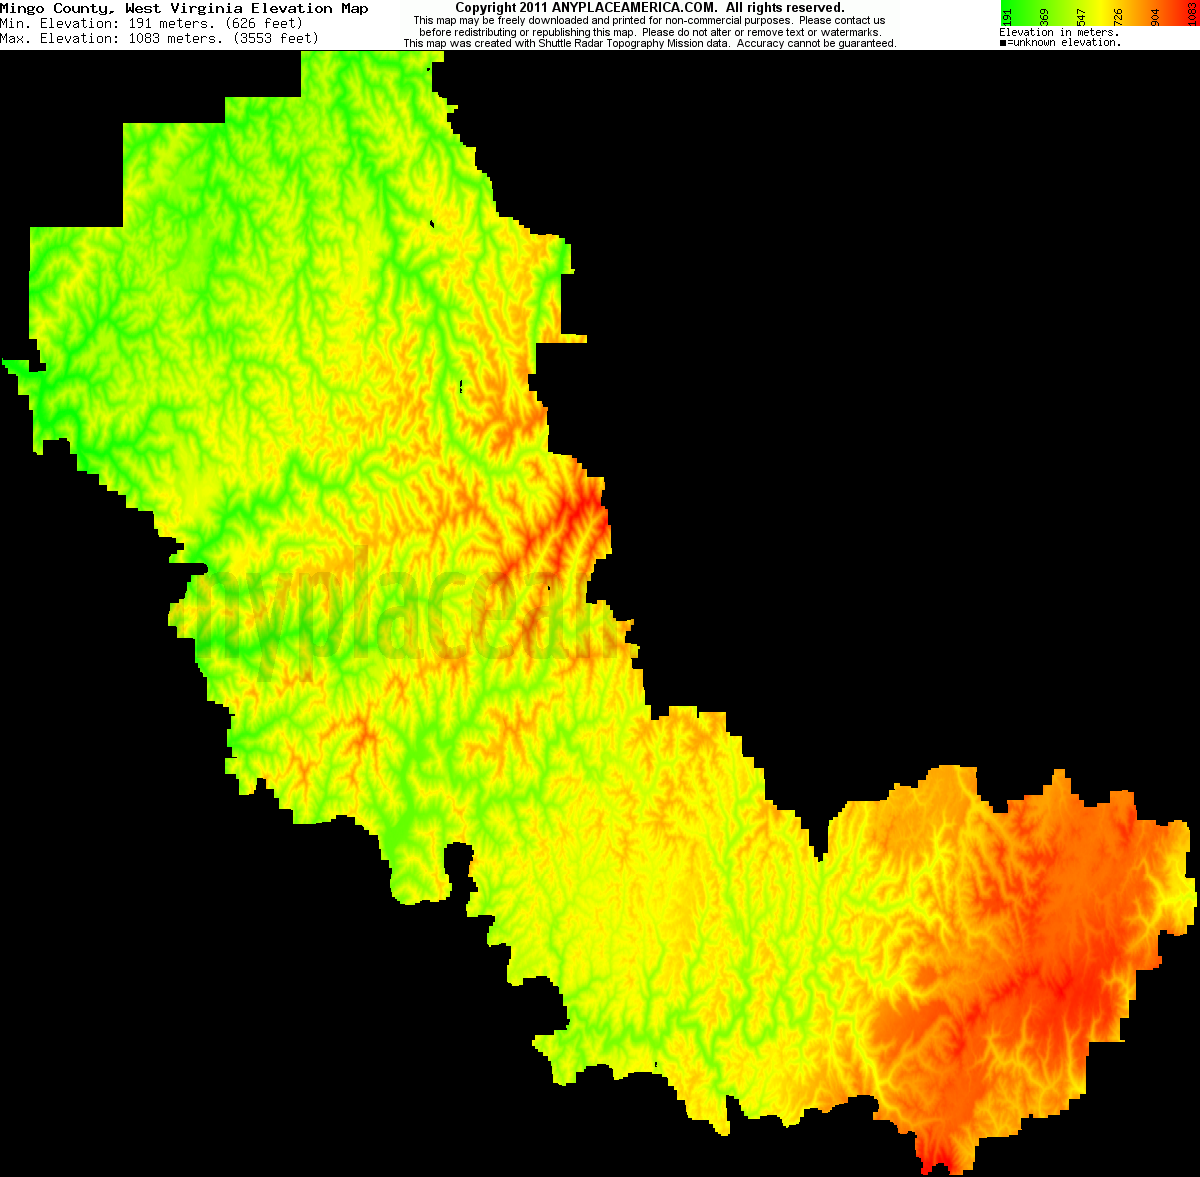 Free Mingo County, West Virginia Topo Maps & Elevations